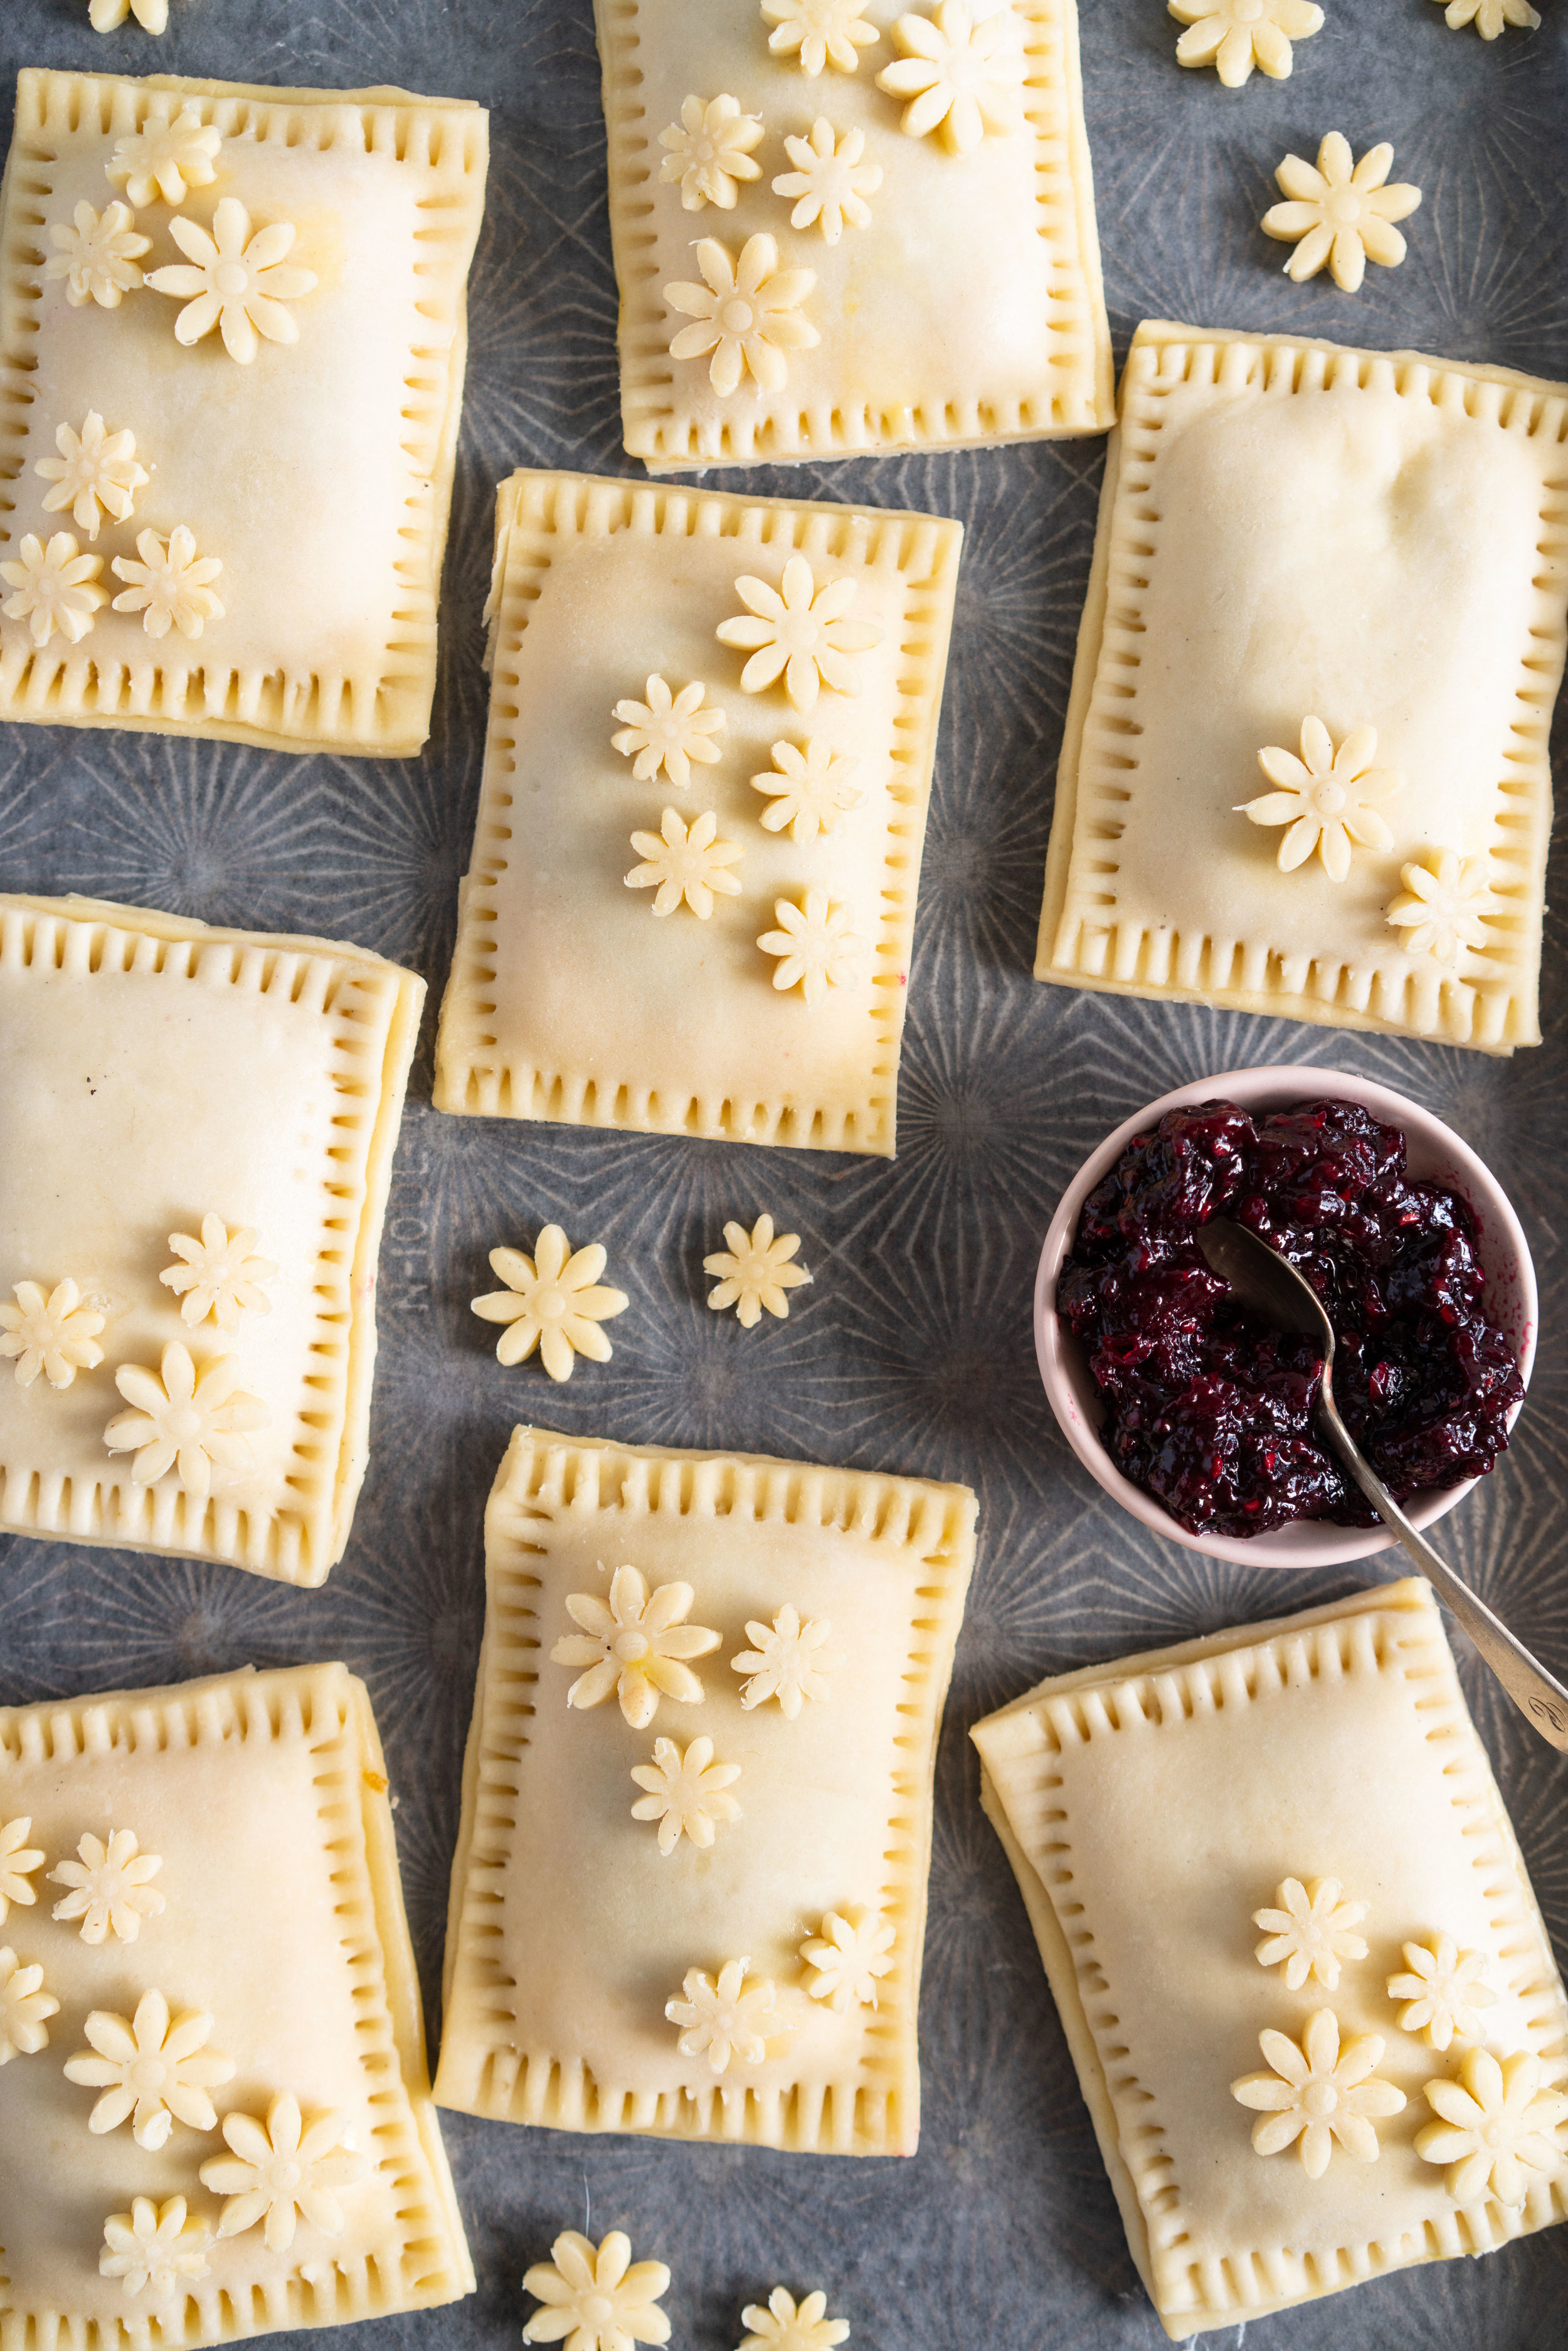 cream cheese and mixed berry jam hand pies ready to bake.jpg